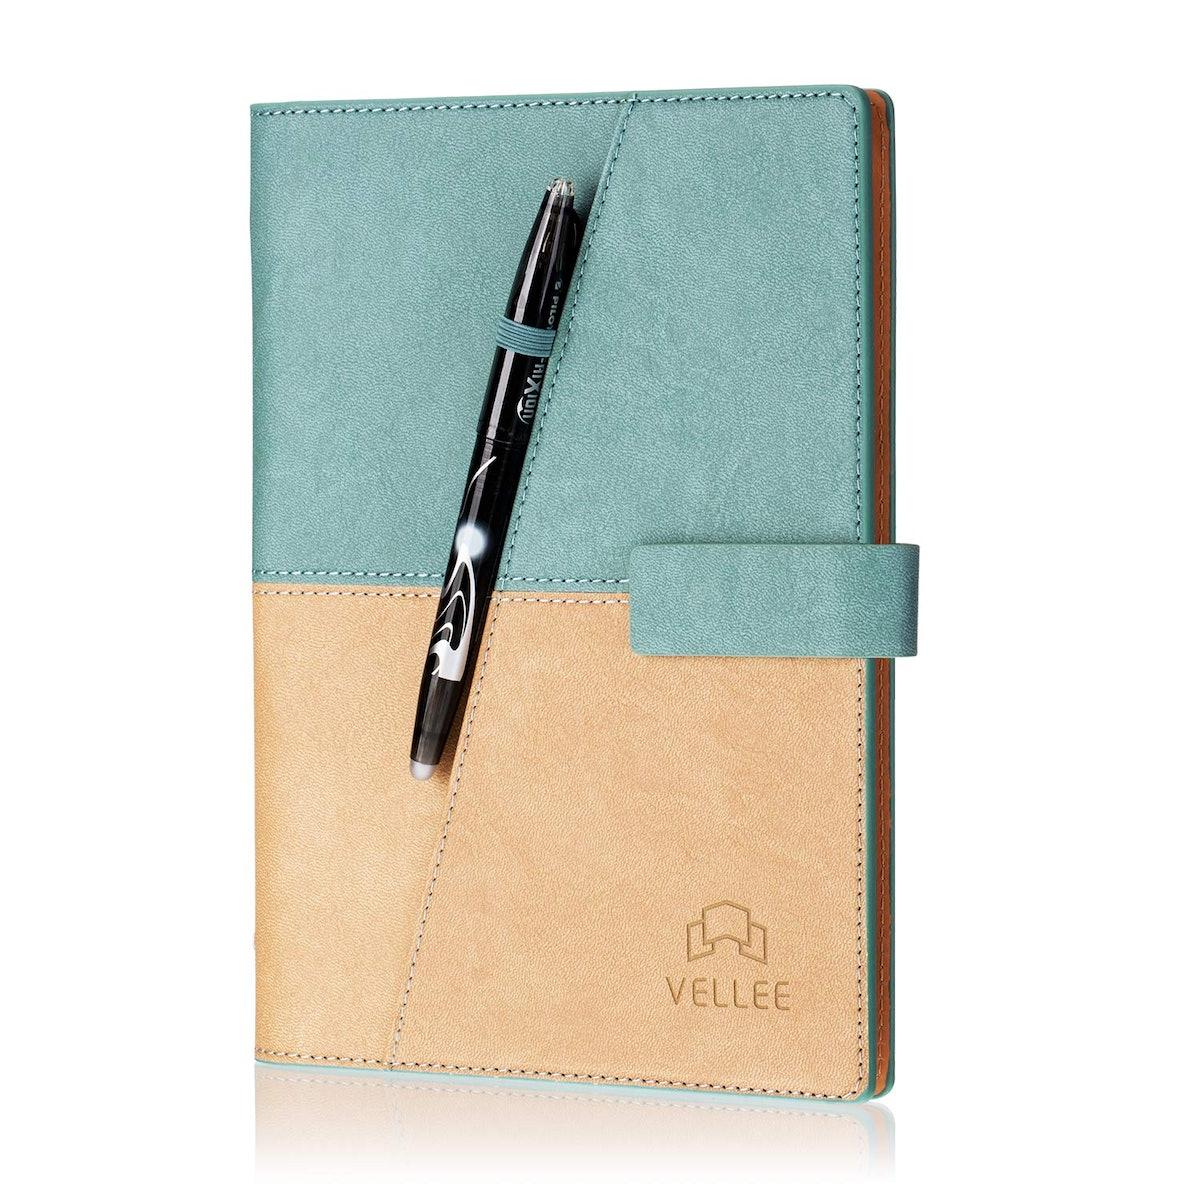 VELLEE Reusable Smart Notebook